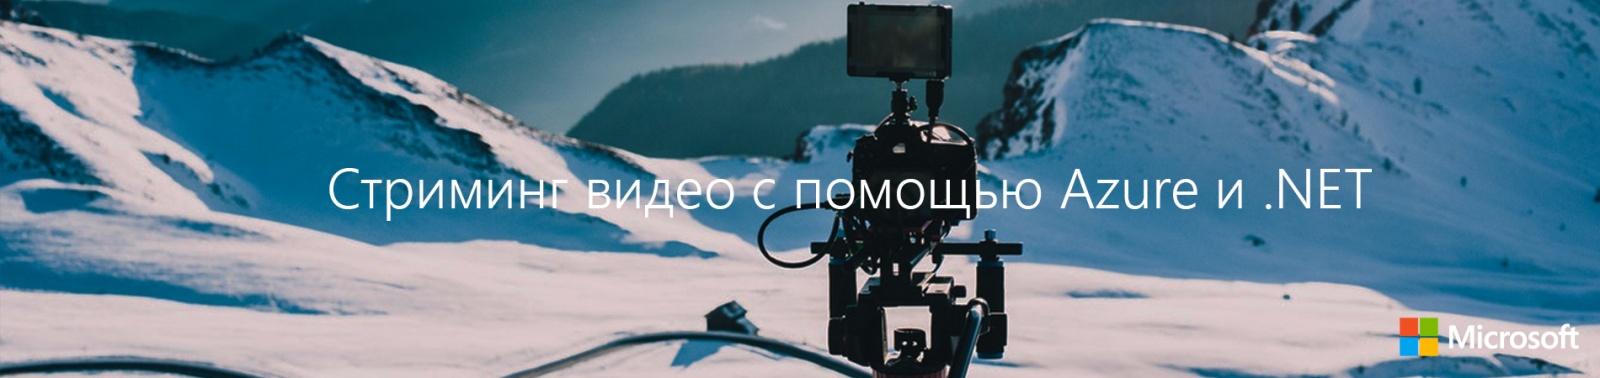 Стриминг видео с помощью Azure и .NET - 1